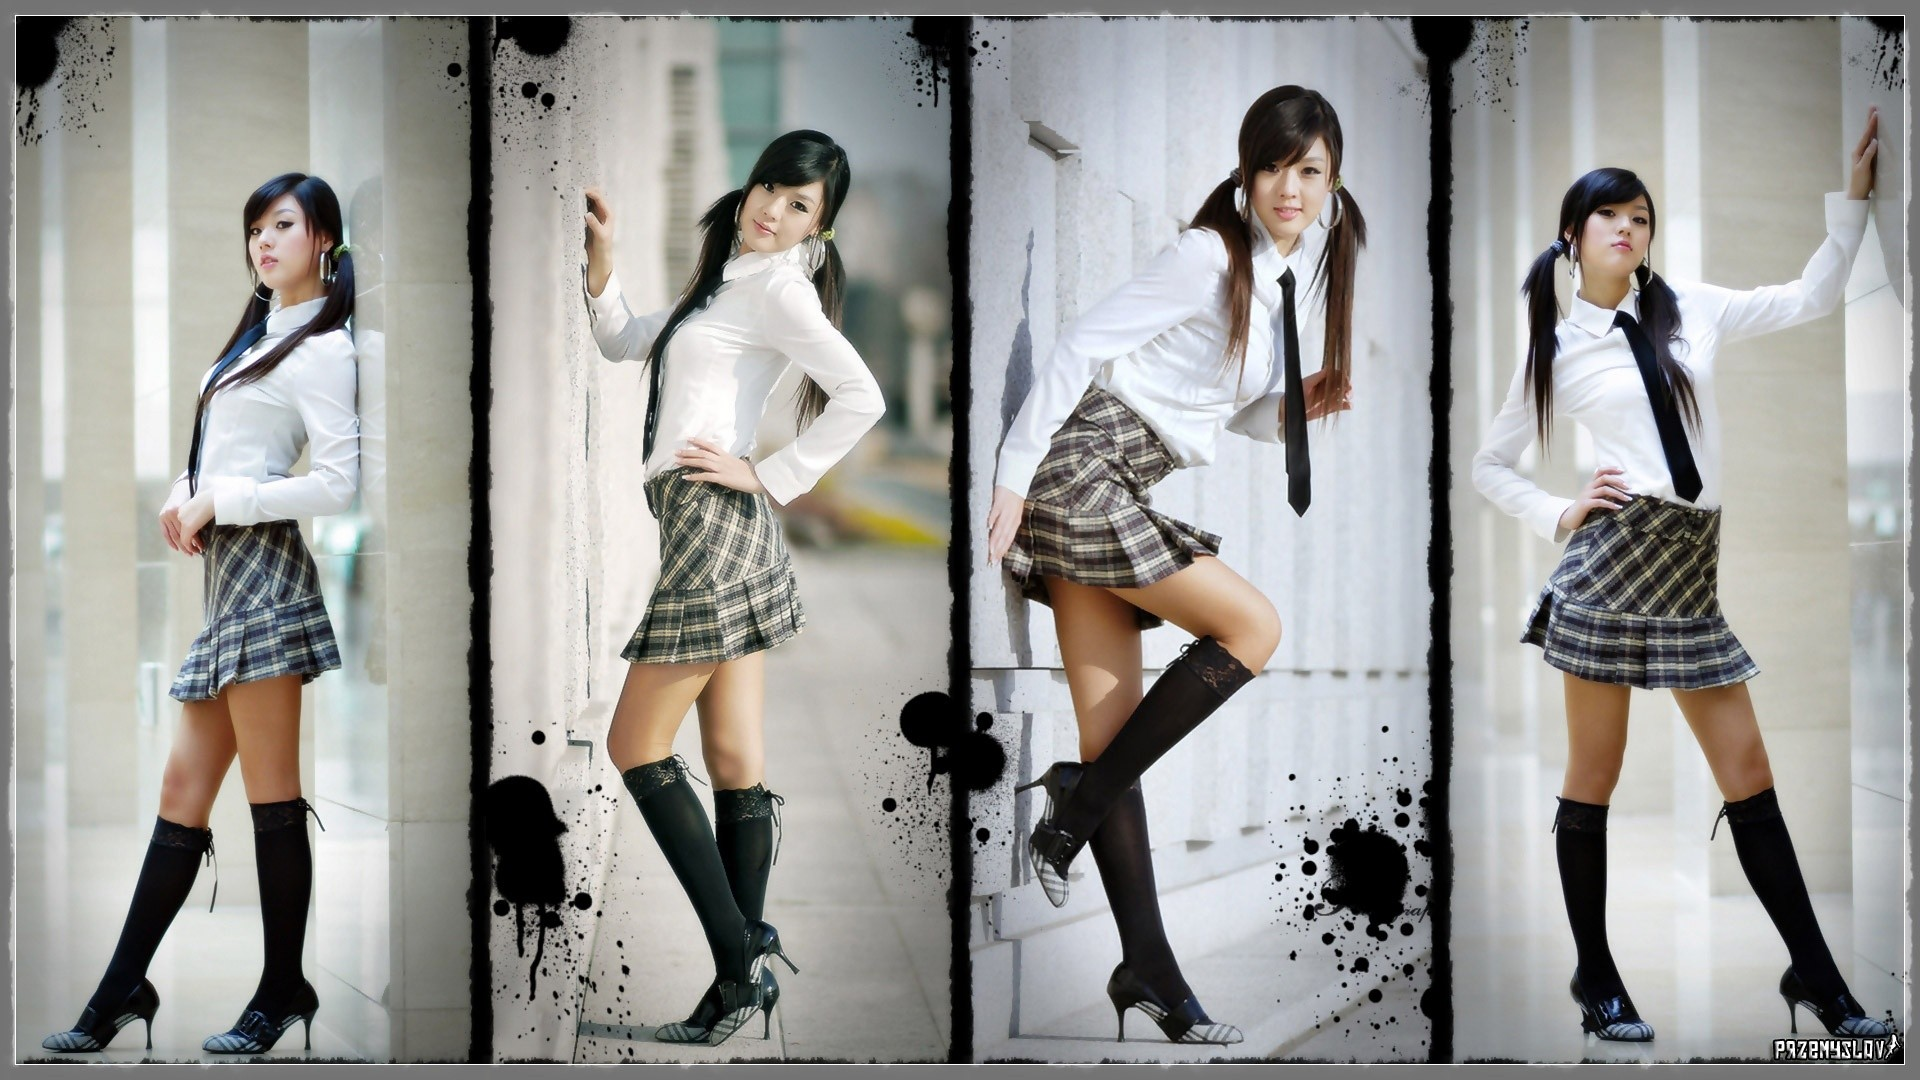 Hwang mi hee full hd wallpaper and background image 1920x1080 celebrity hwang mi hee woman wallpaper voltagebd Choice Image